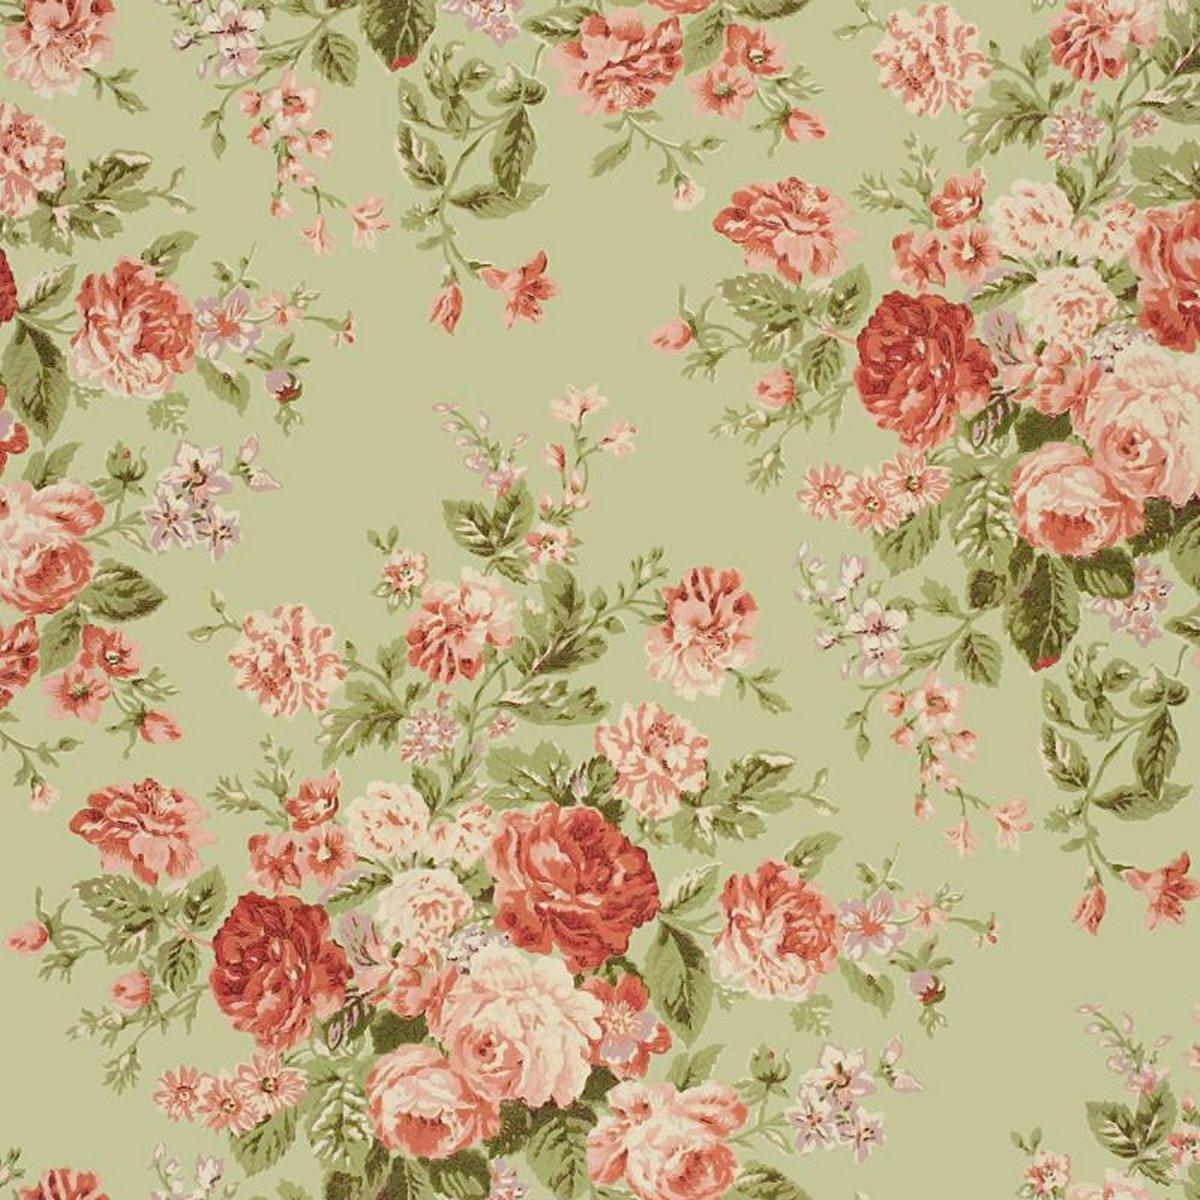 vintage roses tumblr background